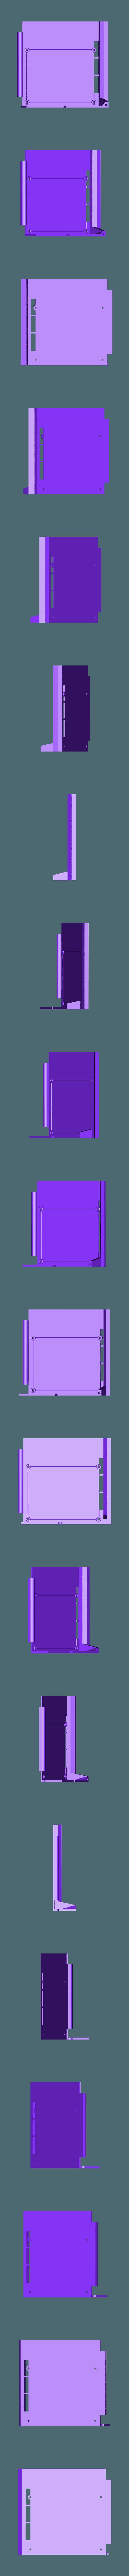 TeachingTech_SKR_1.3_D3_Right.stl Download free STL file Vertical Fan Duct Universal Rear Electronics Case for Ender 3 • 3D printing object, D3Dorsett